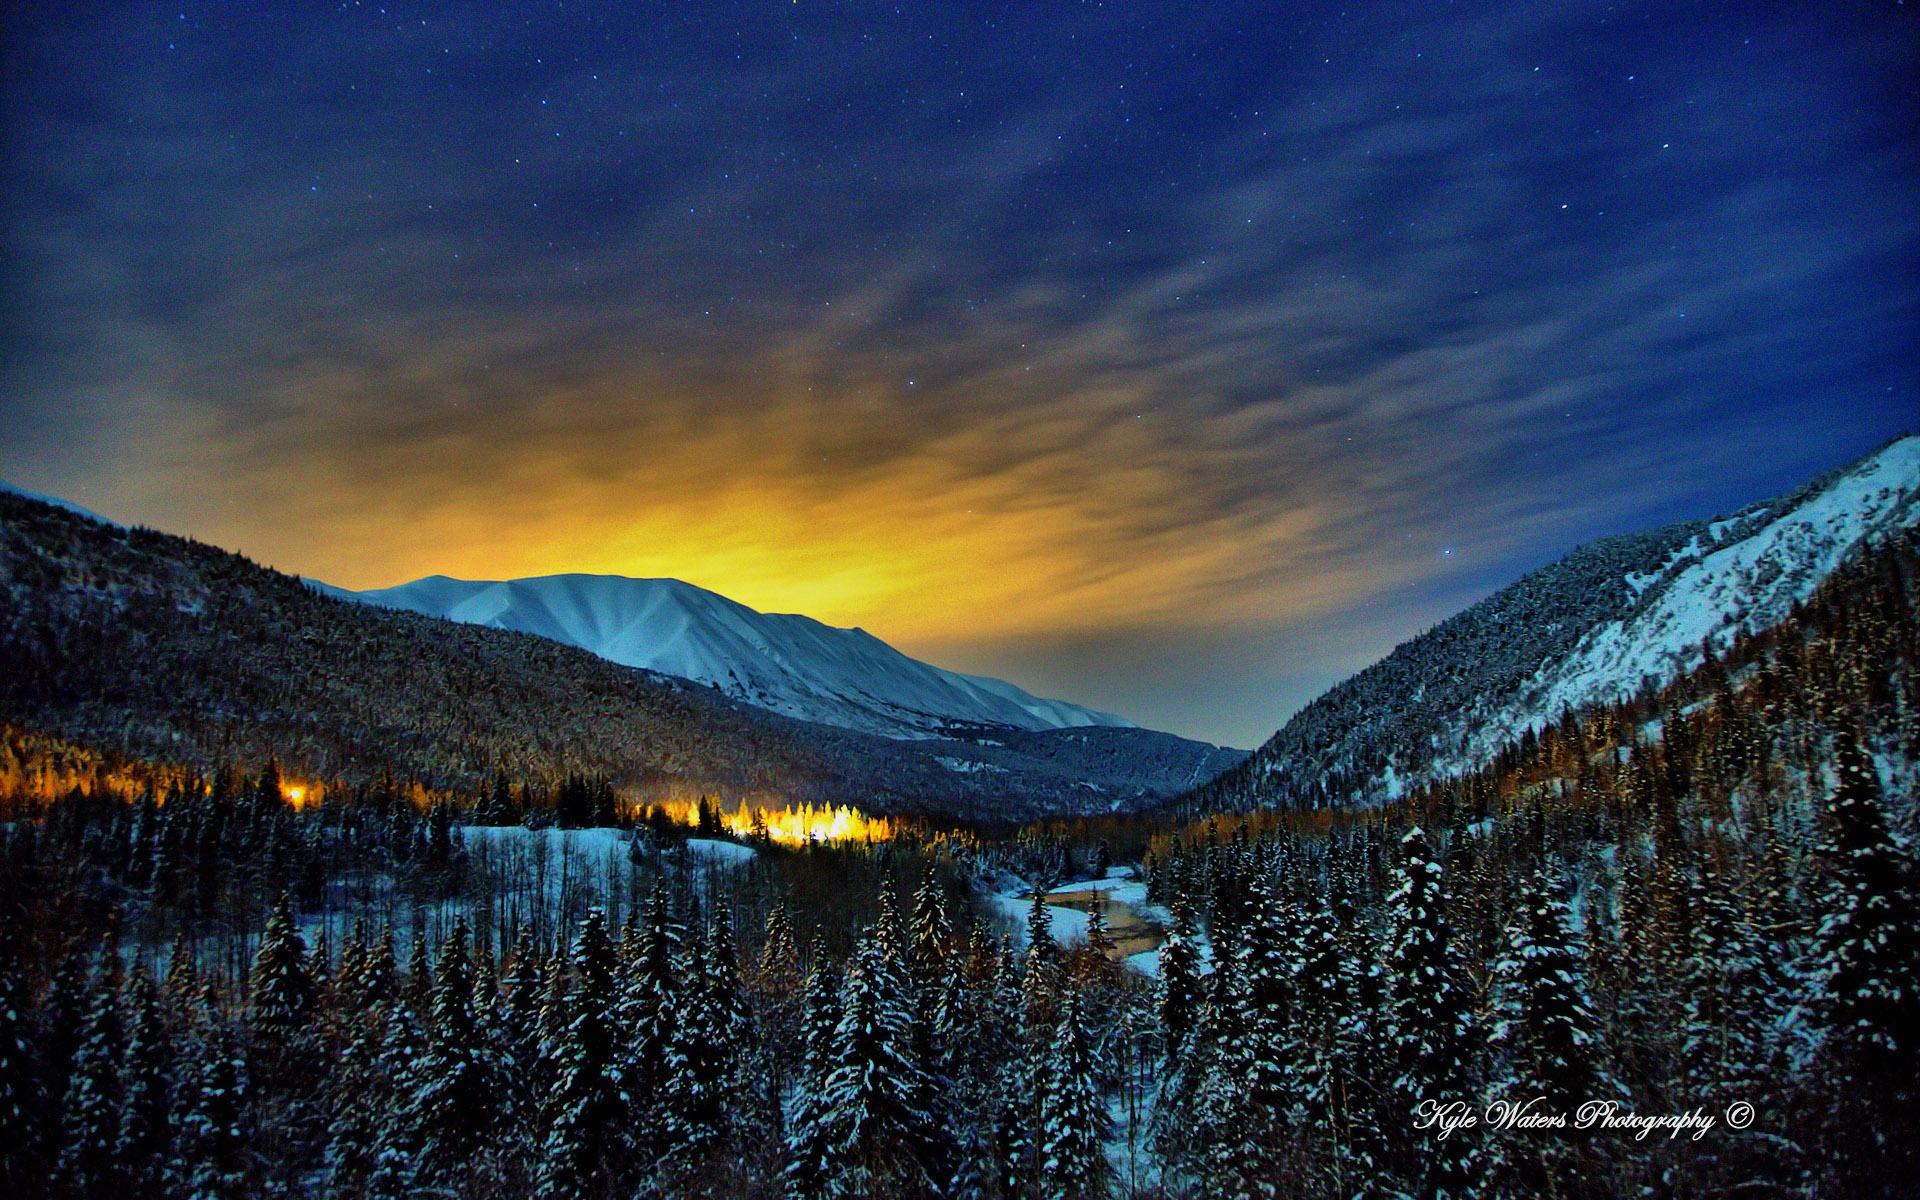 Alaska Winter Nights Wallpapers In Jpg Format For Free Download